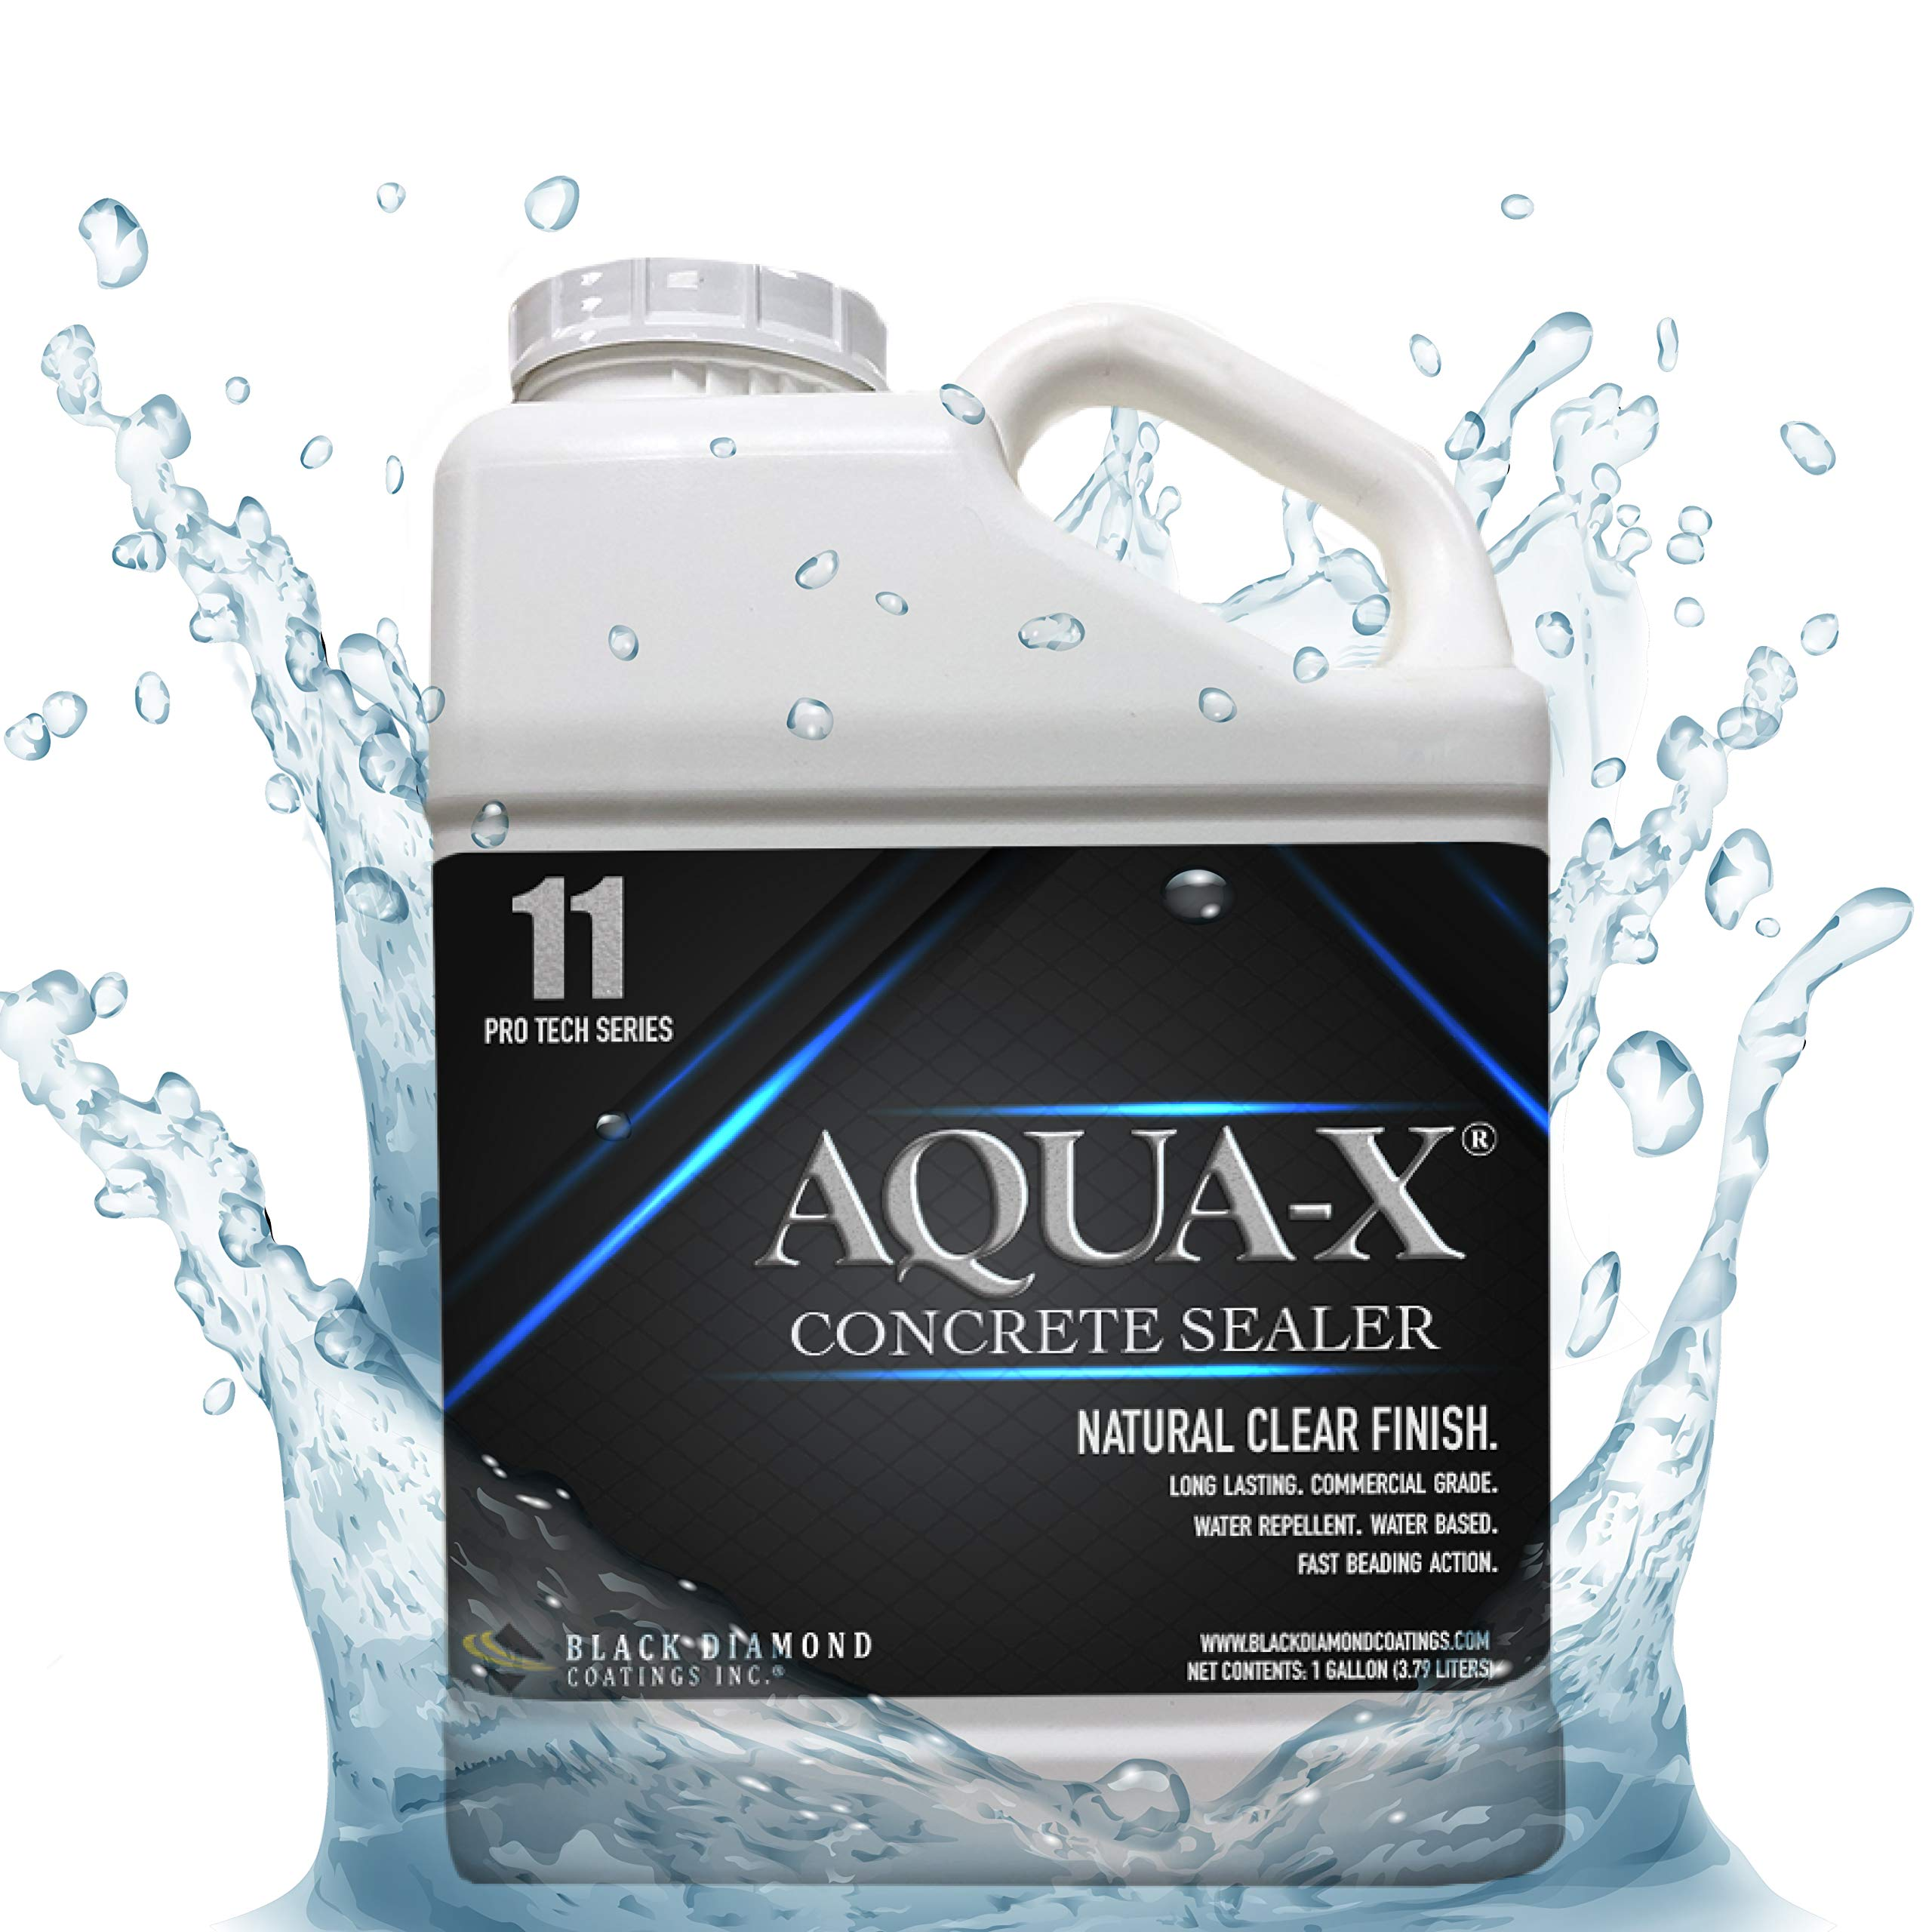 1 Gallon AQUA-X 11 Clear, Penetrating Concrete Sealer – Mold and Mildew Inhibitor